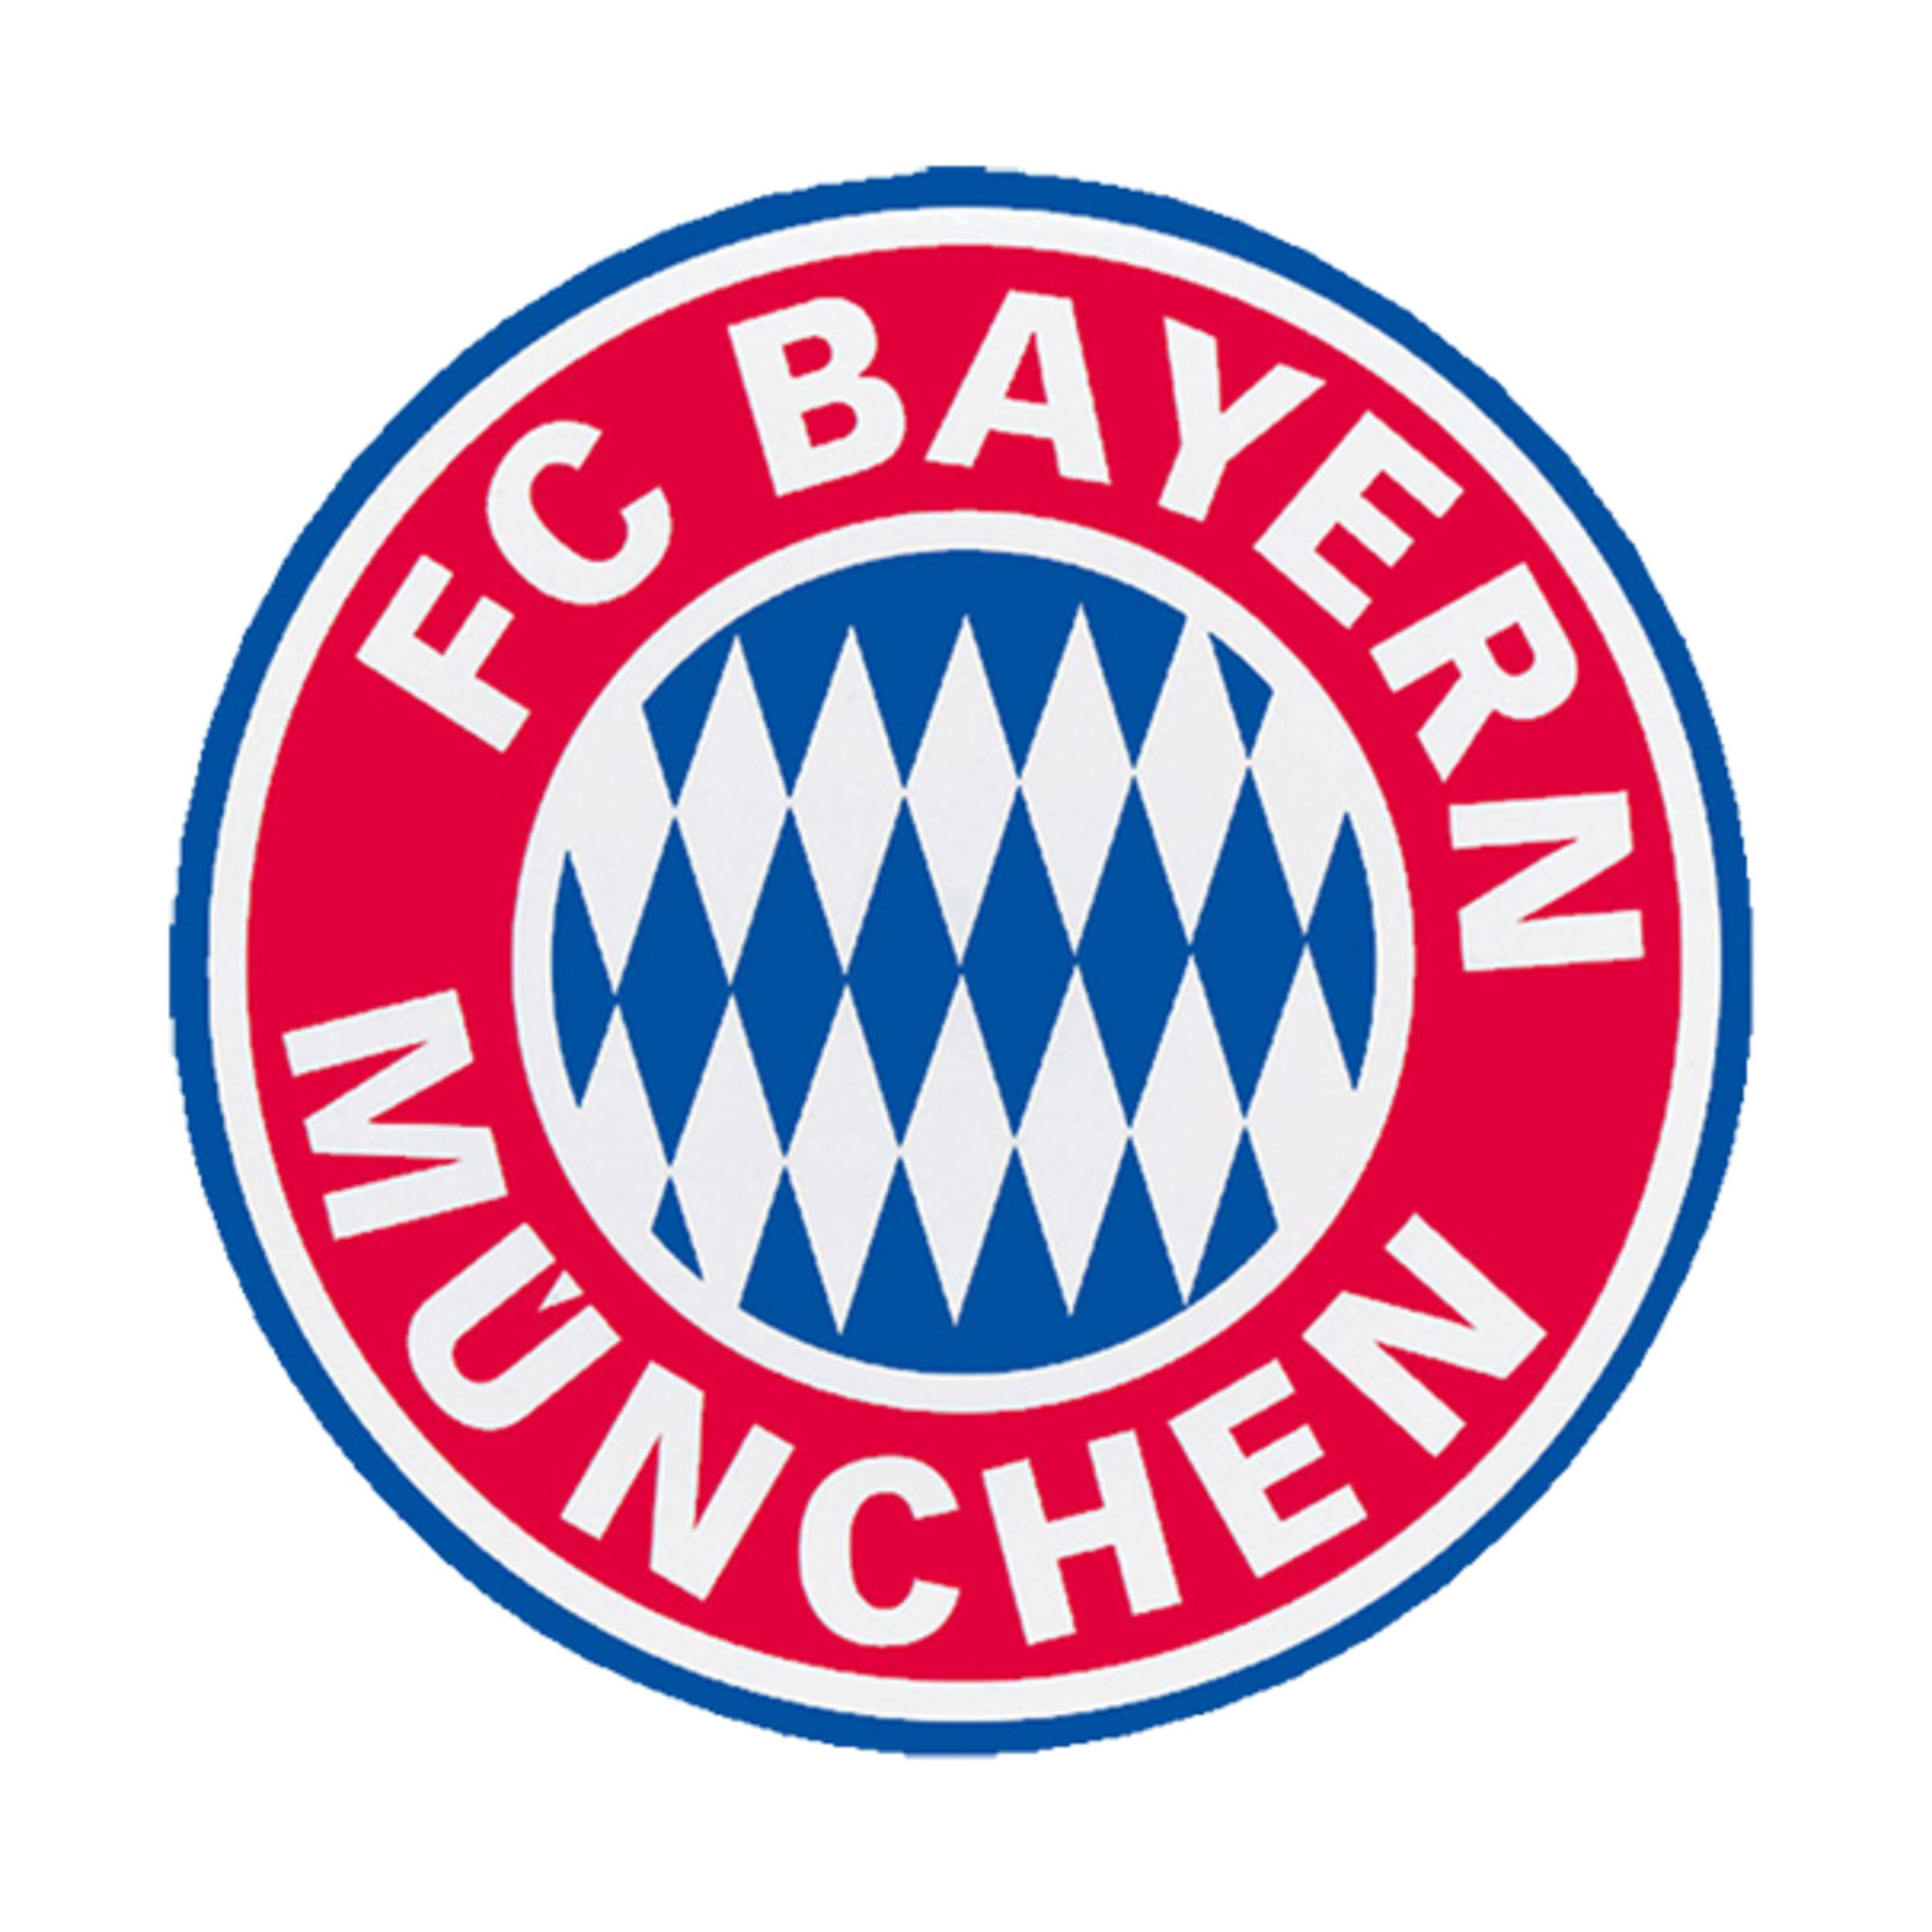 sticker emblem  bayern and football team